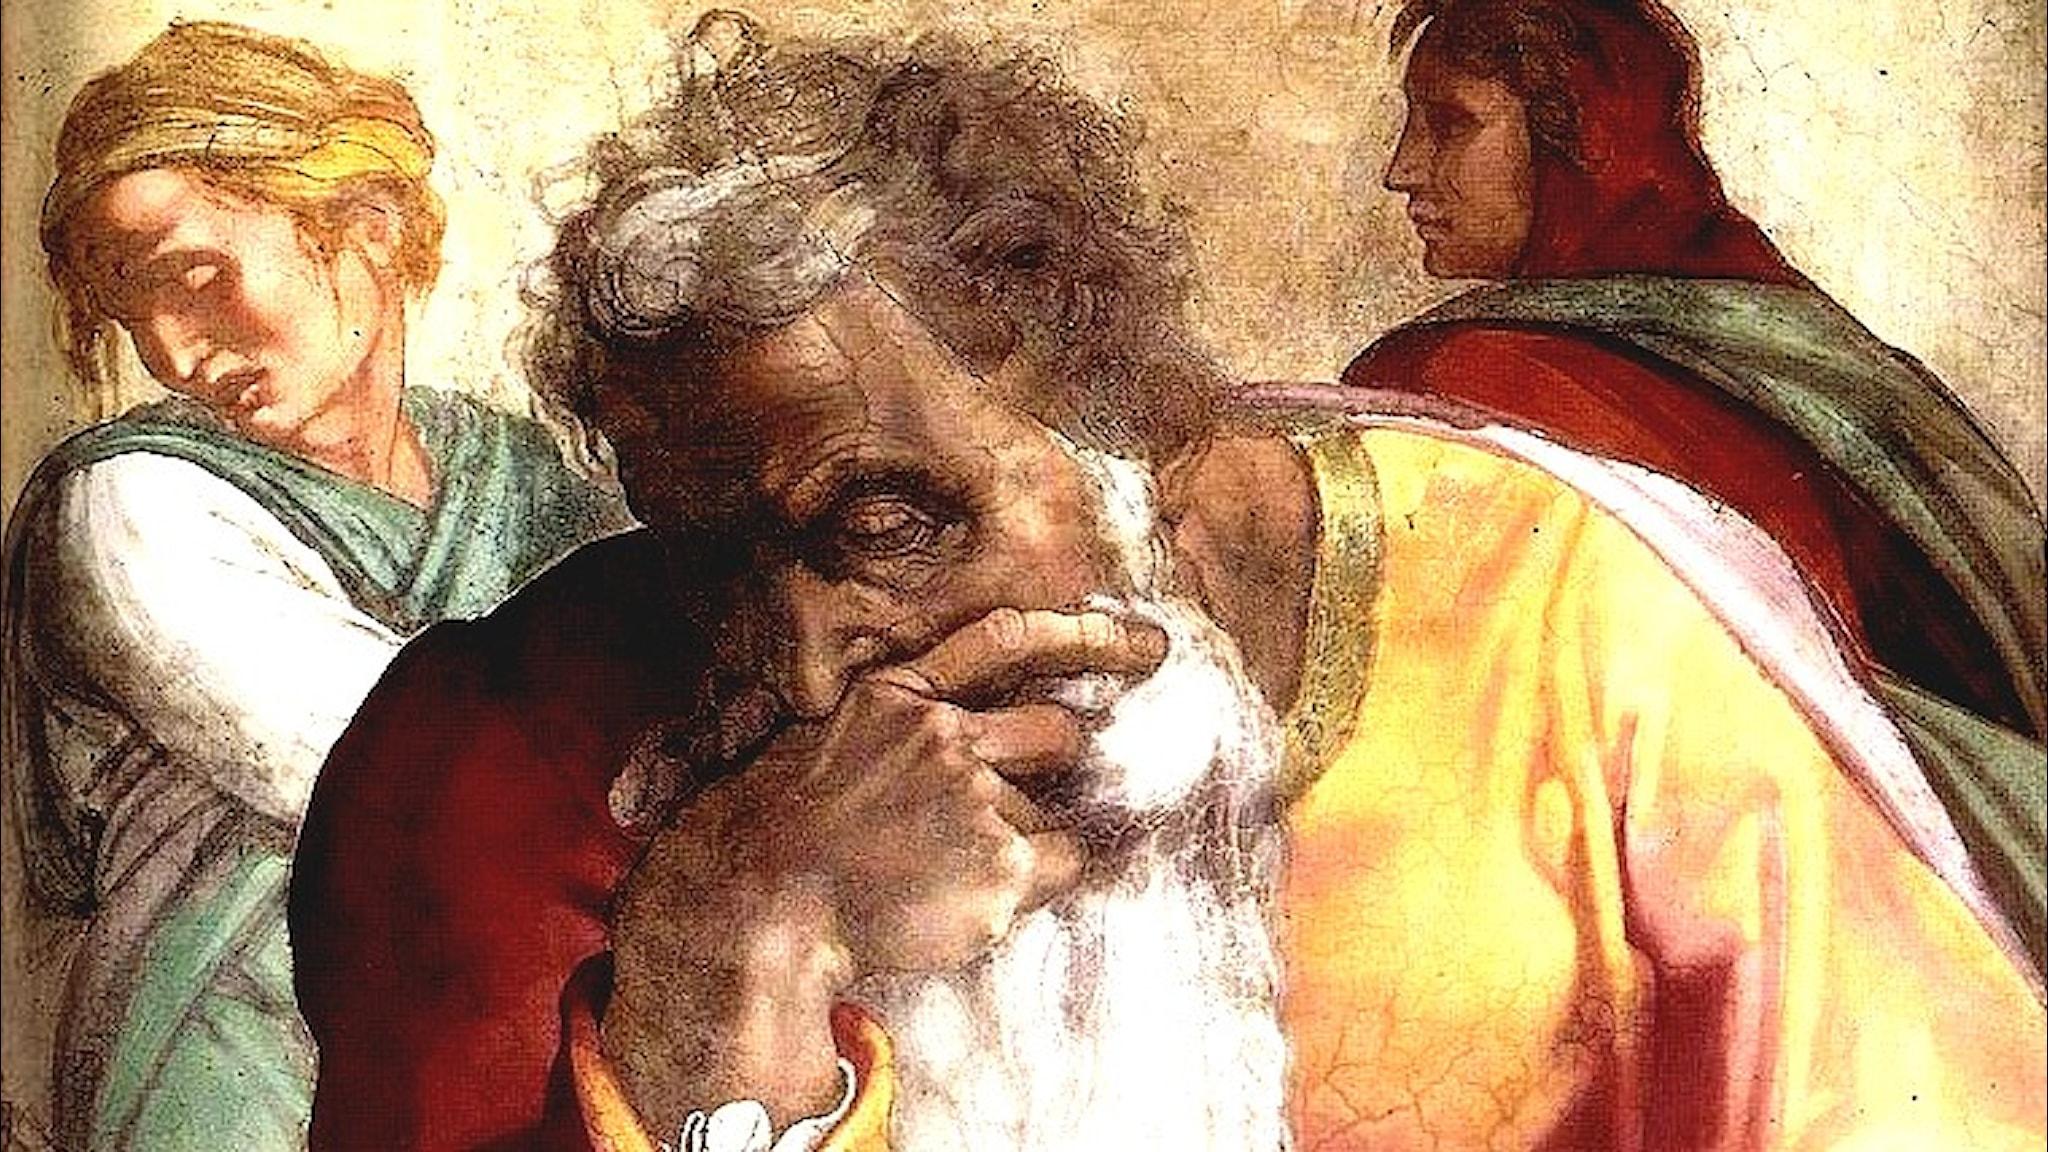 Profeten Jeremia. Michelangelo, 1512.